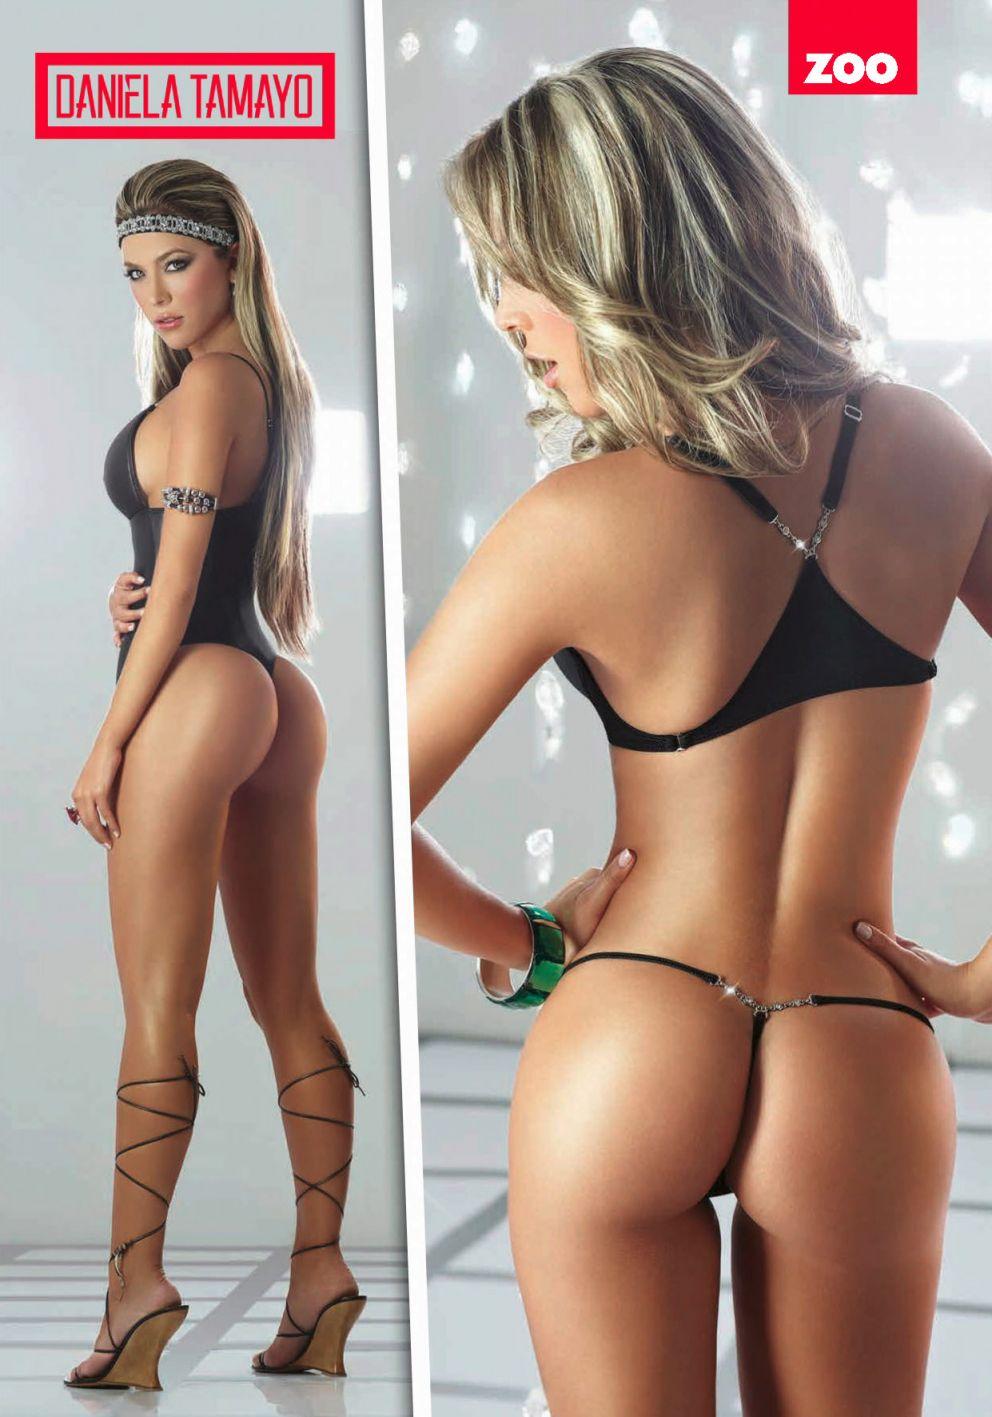 https://www.lapatilla.com/site/wp-content/uploads/2015/06/Daniela-Tamayo-ZOO-2.jpg